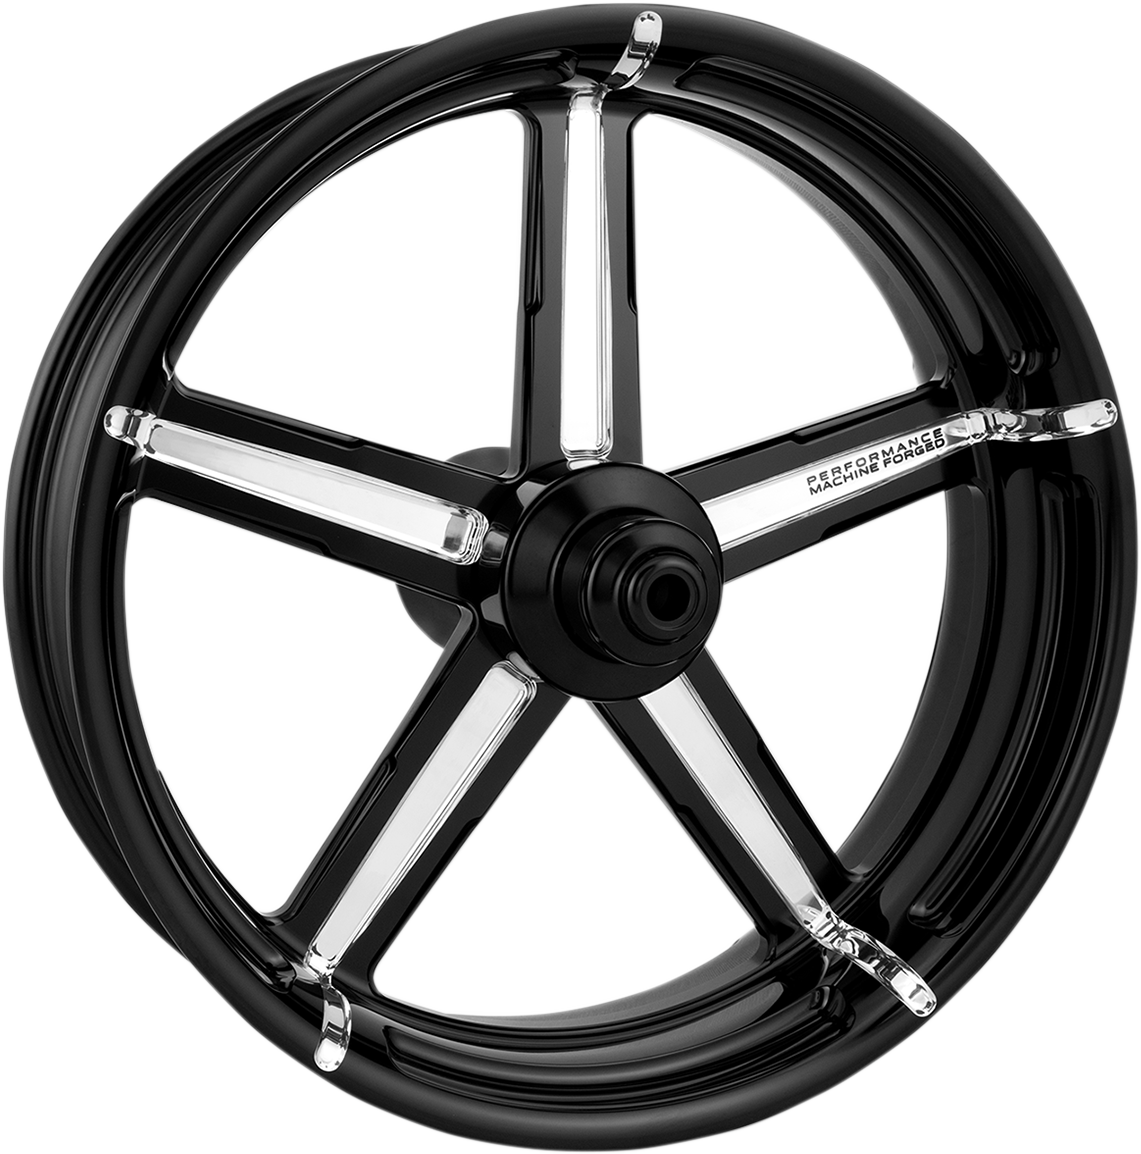 "Performance Machine Formula 18"" ABS Rear Wheel 09-19 Harley Touring FLHX FLHR"